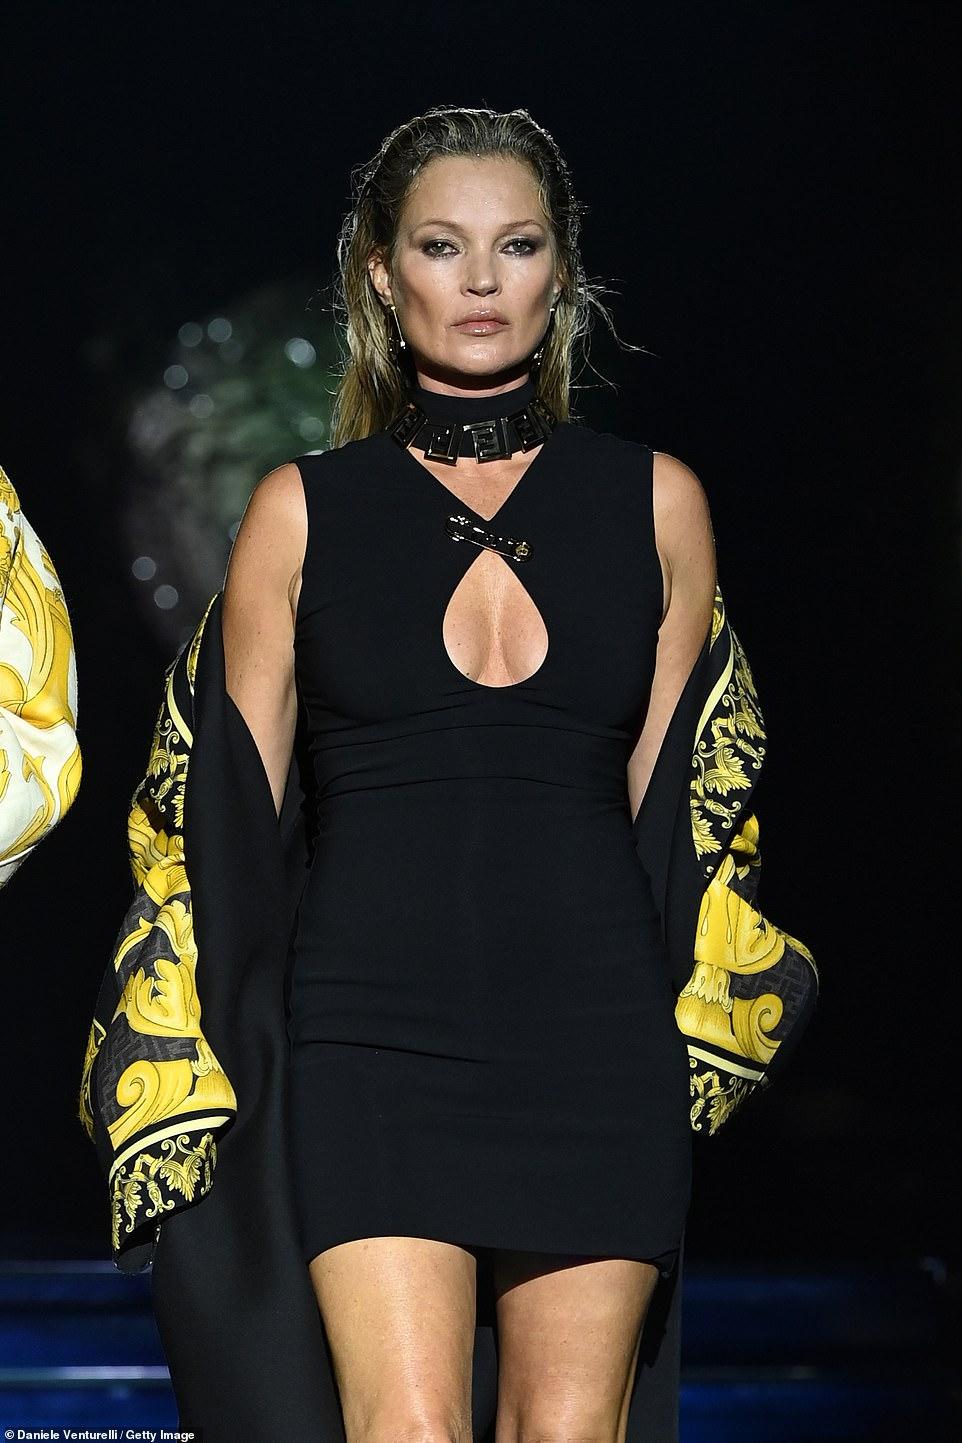 Supermodel: Kate Moss also exhibited her modelling expertise